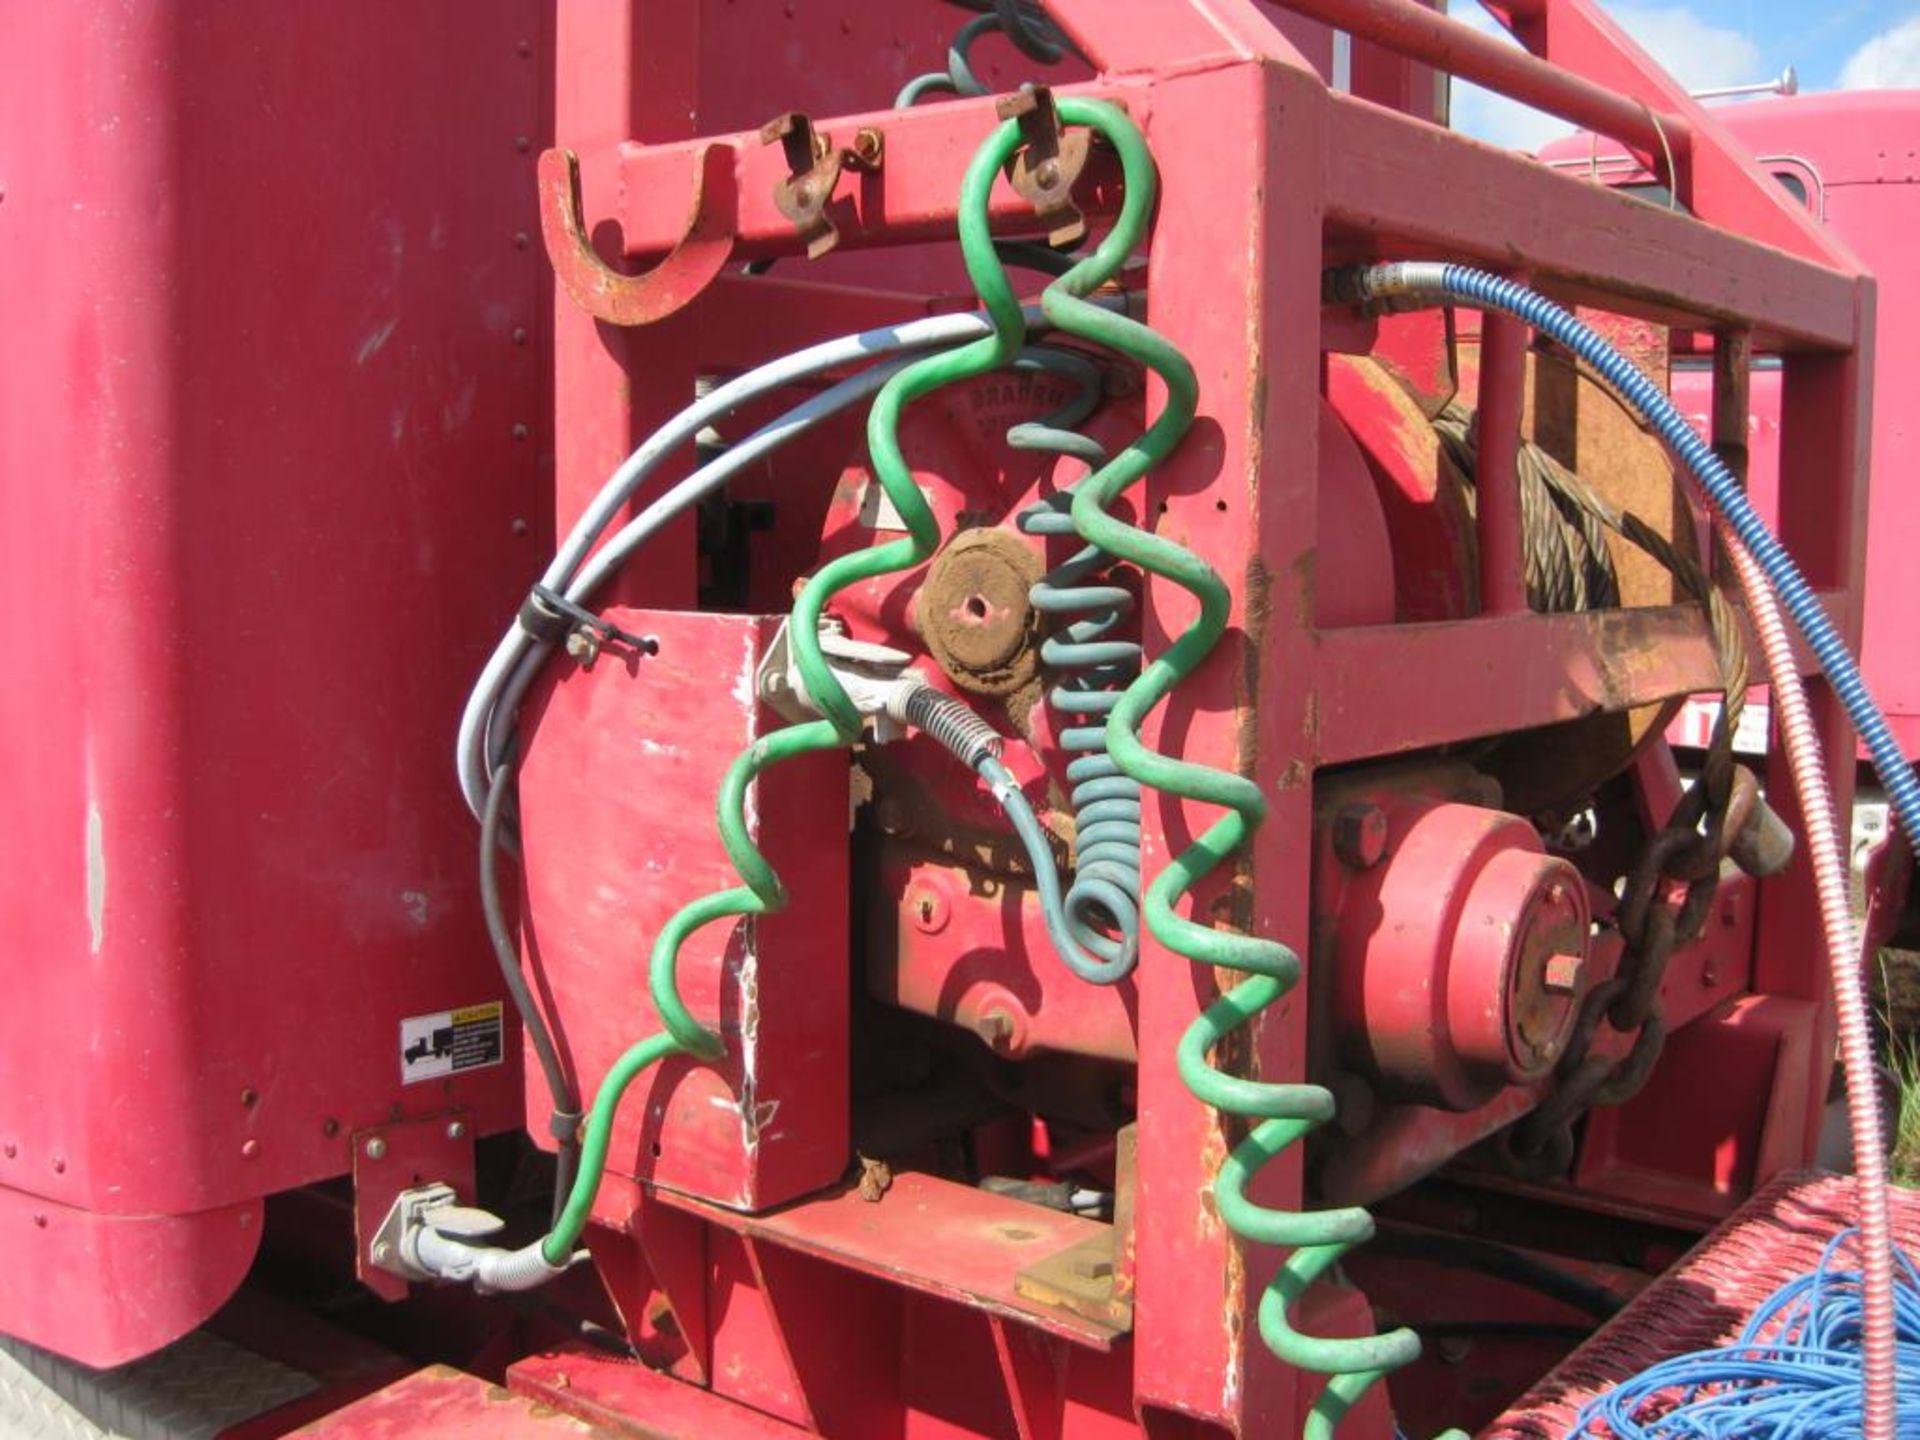 Kenworth Winch Truck - Image 11 of 23